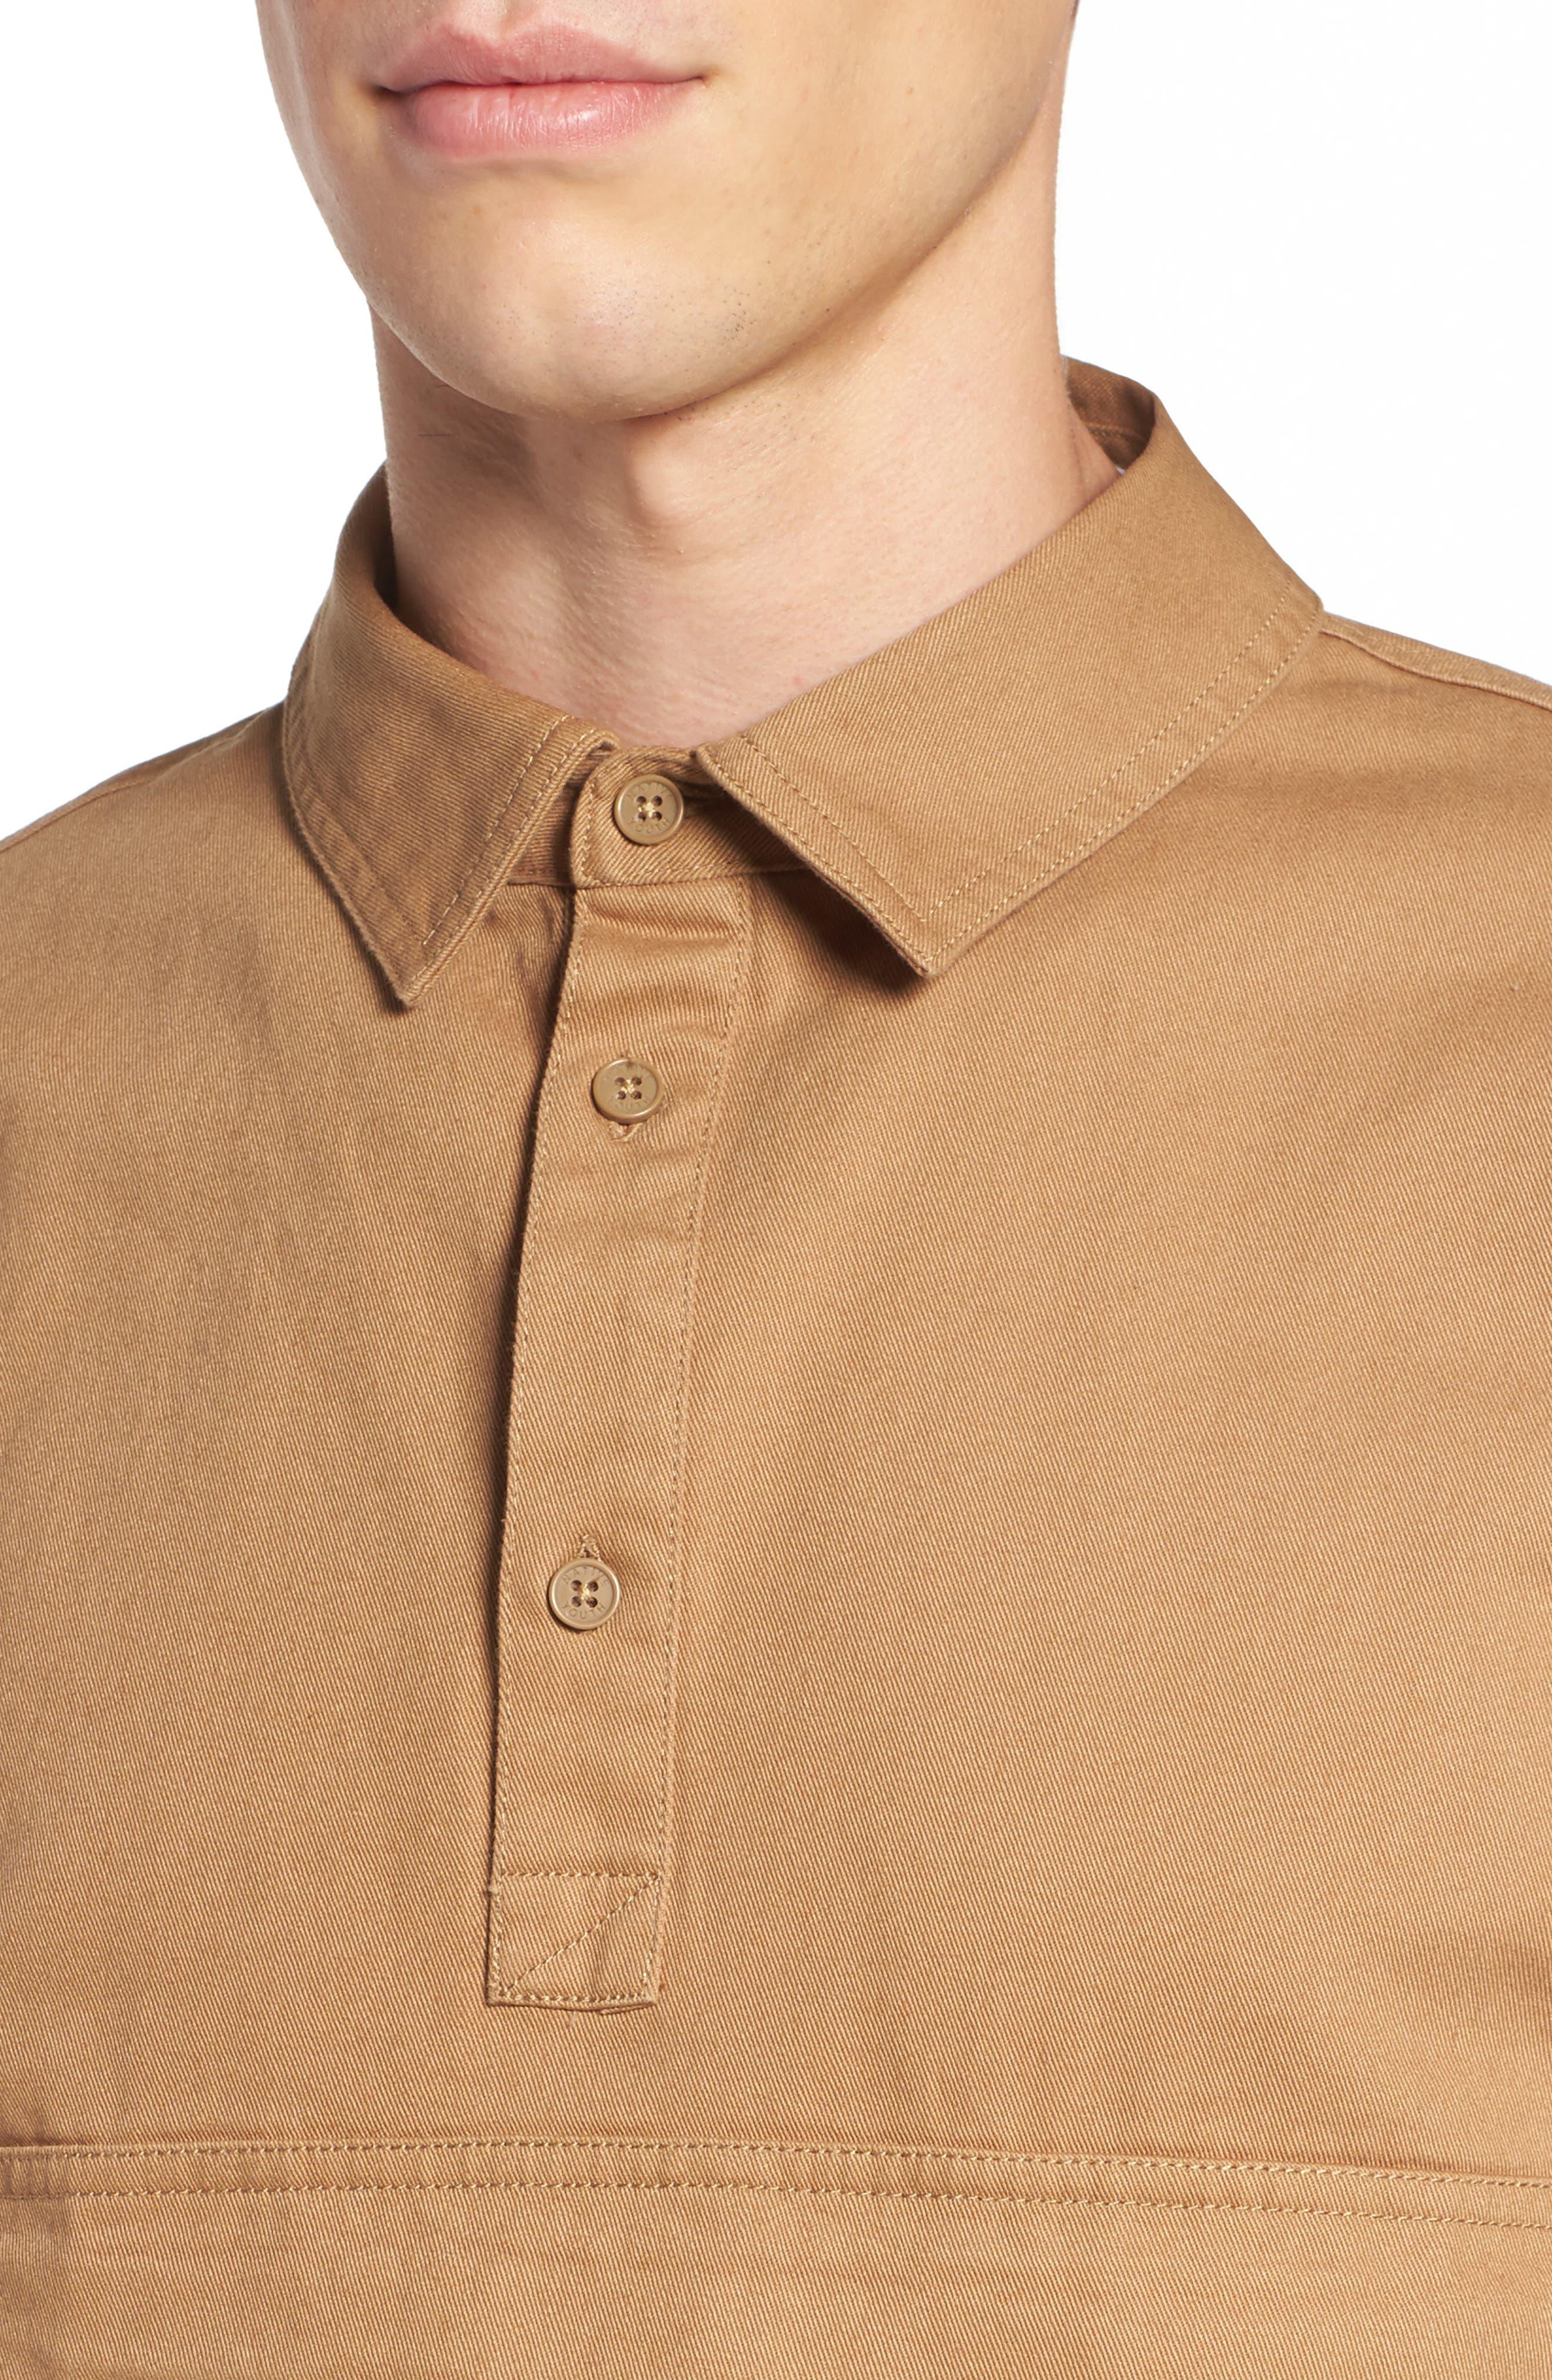 Woodside Twill Shirt,                             Alternate thumbnail 4, color,                             250